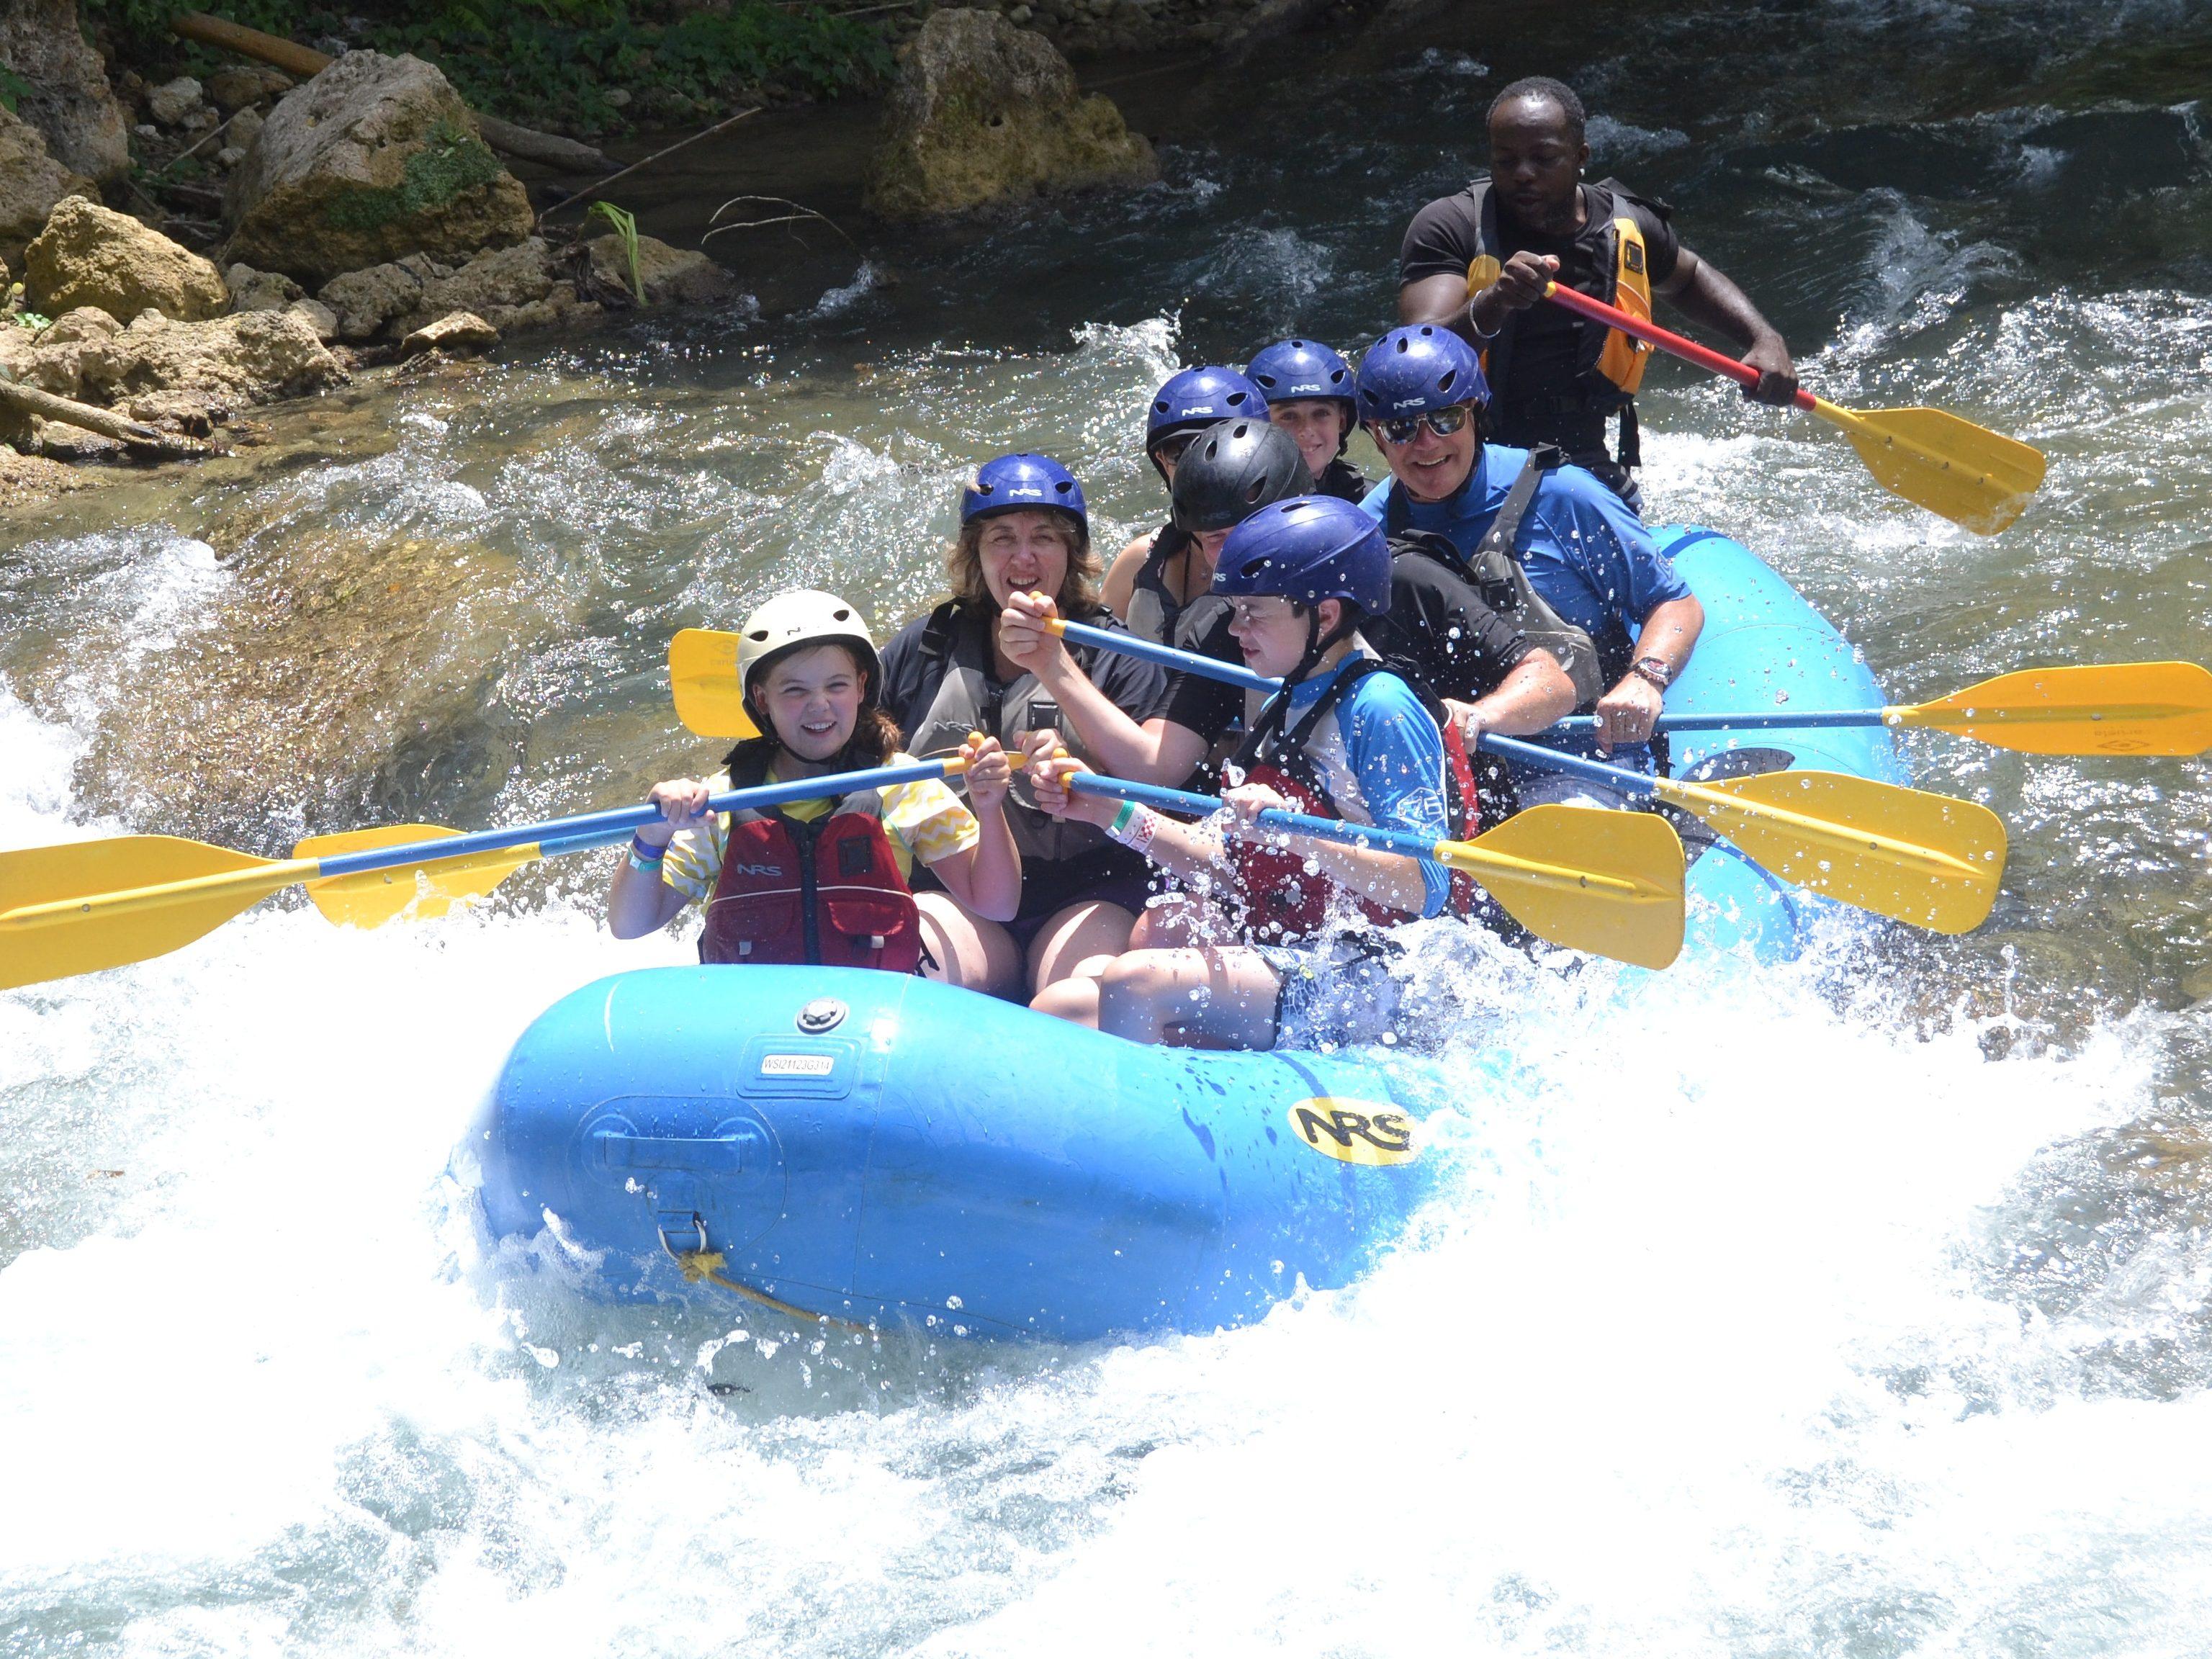 Jamaica River Rafting Tubing From Ocho Rios Port Antonio Kingston The South Coast